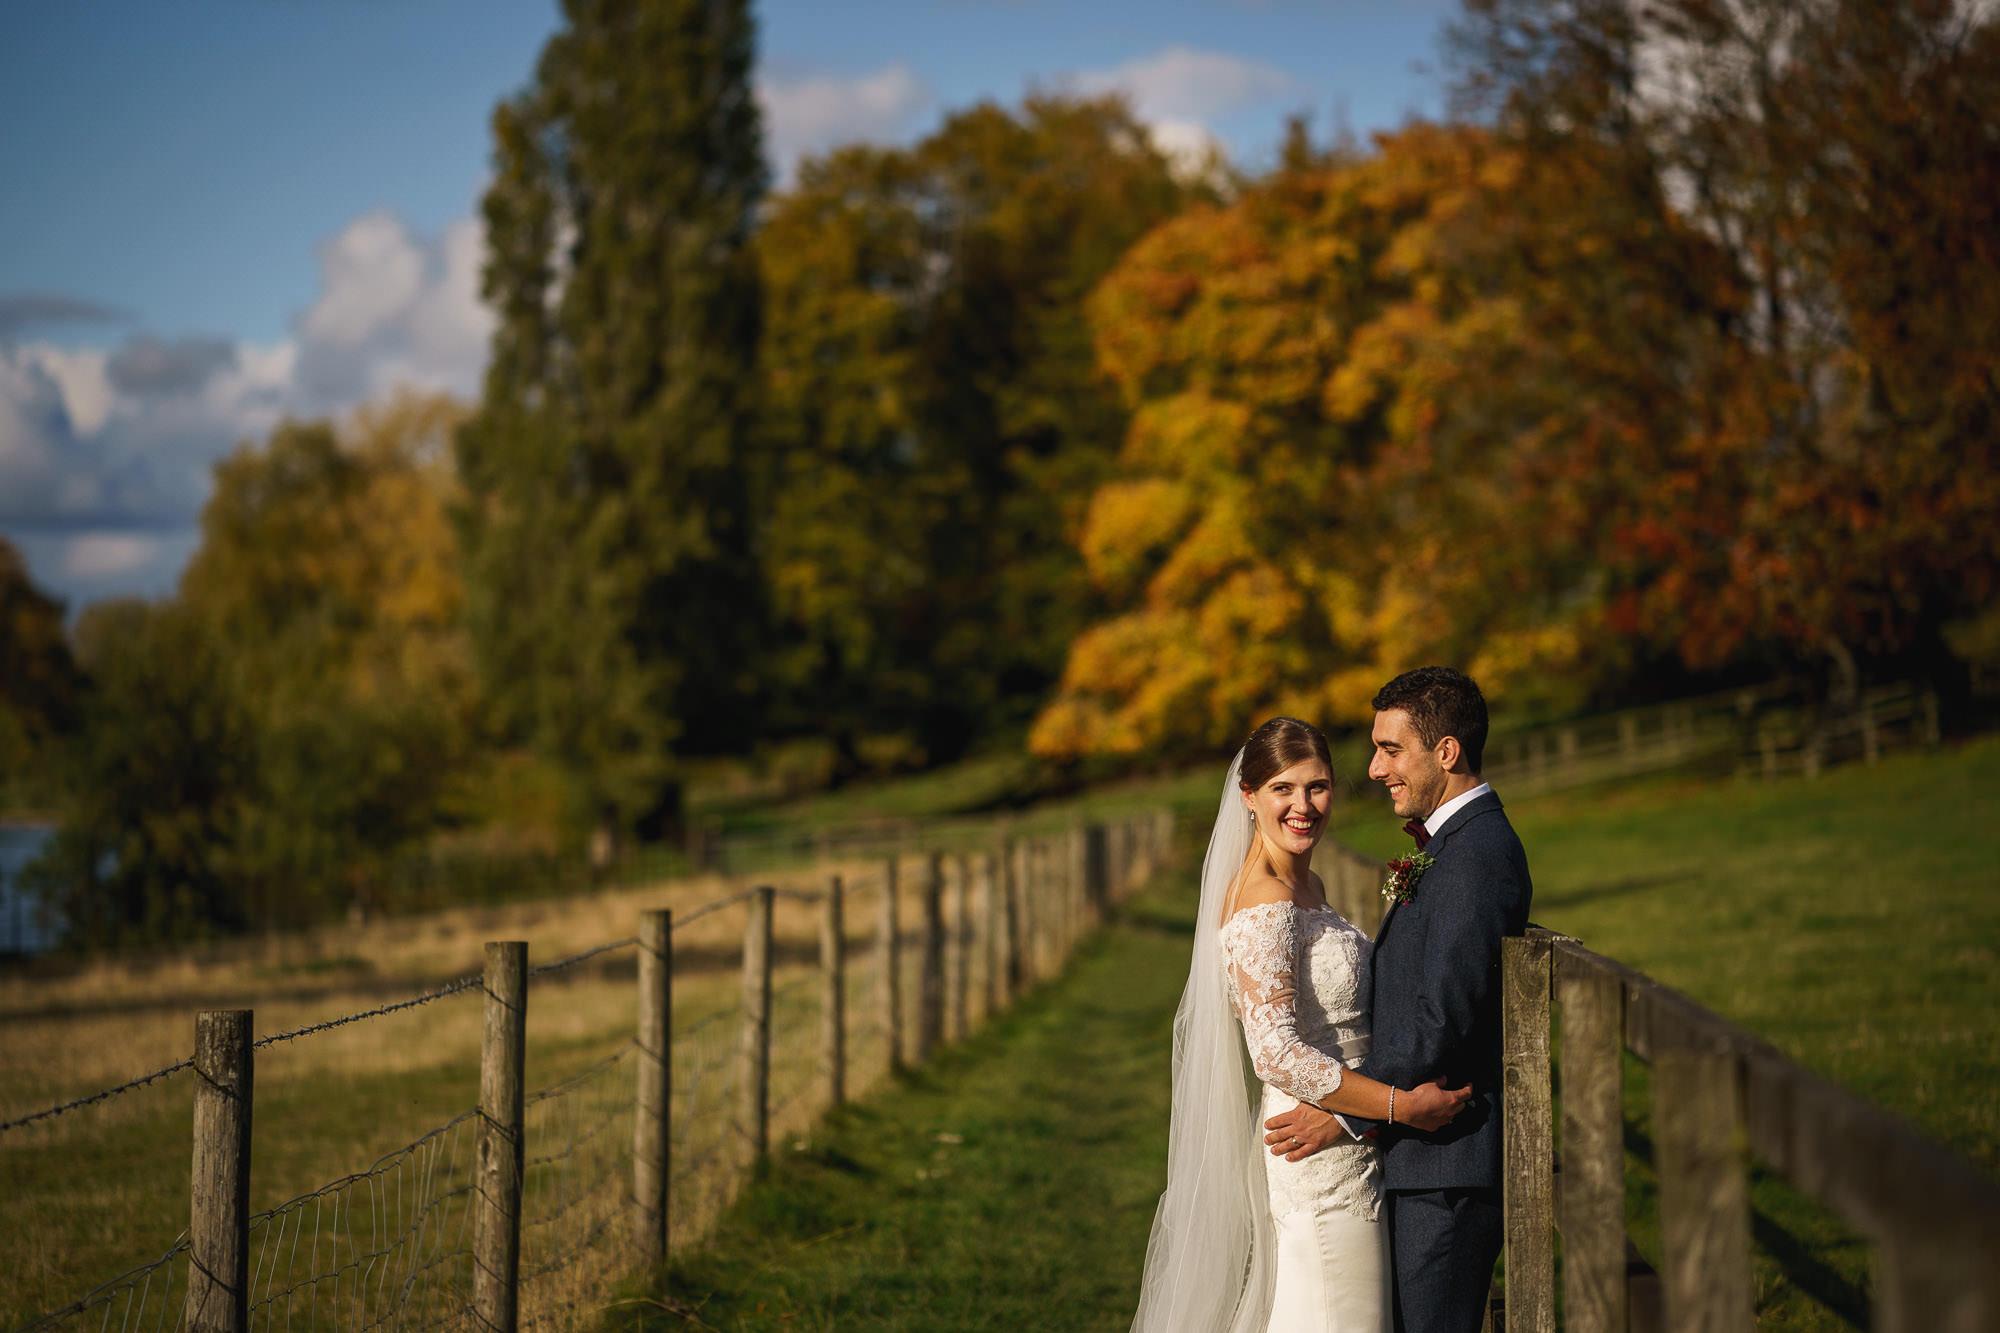 Lains Barn wedding photographer - Jane + Chris